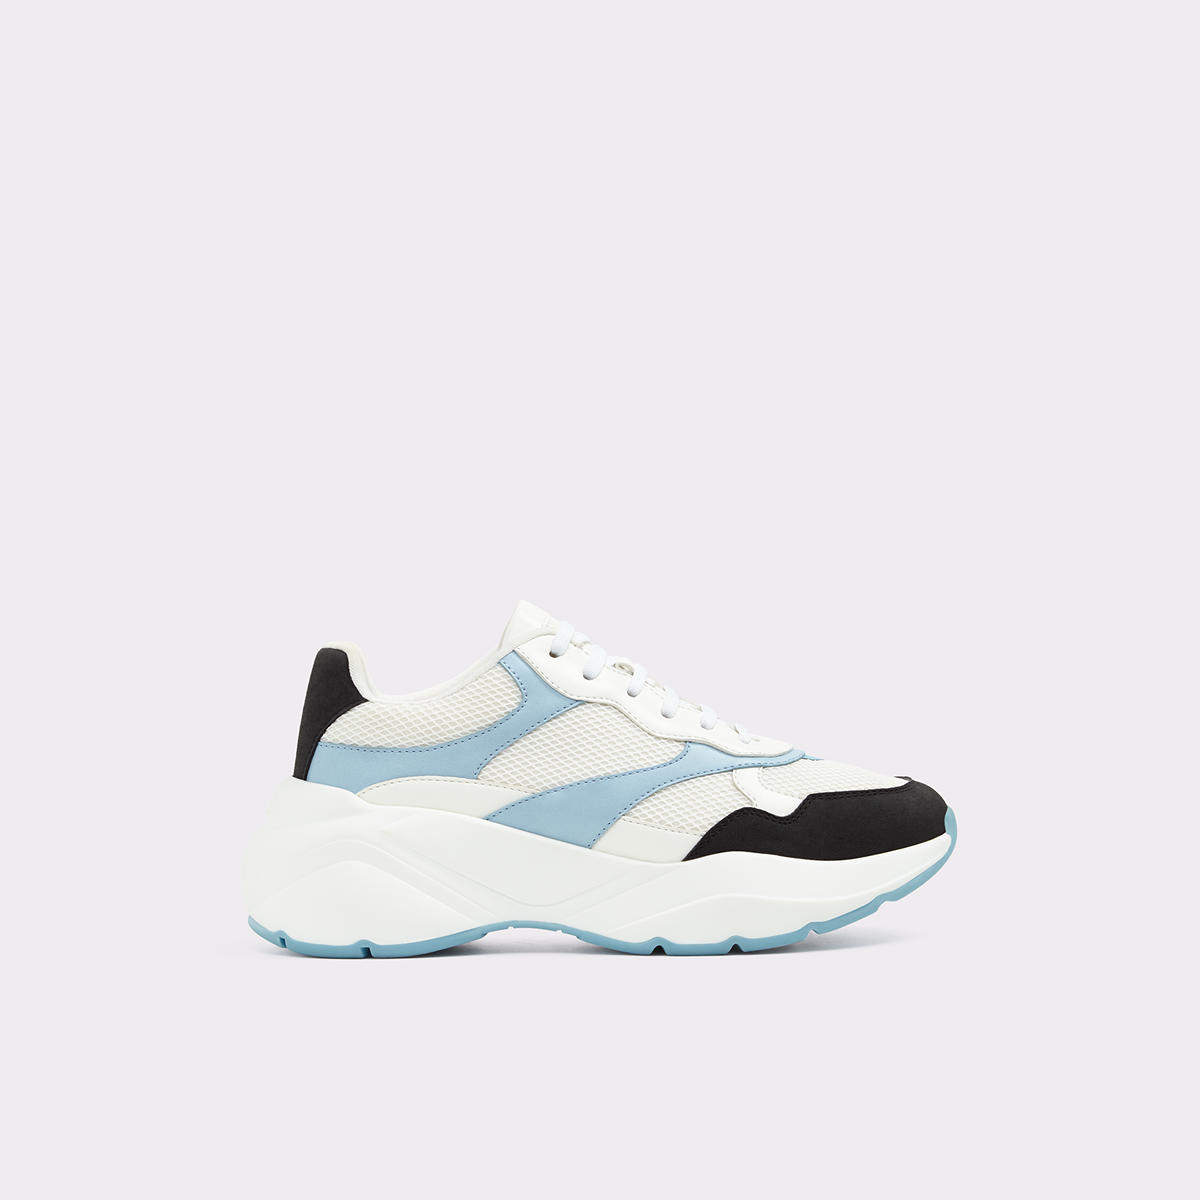 11c96d0080d2 Merurka Light Blue Women s Sneakers